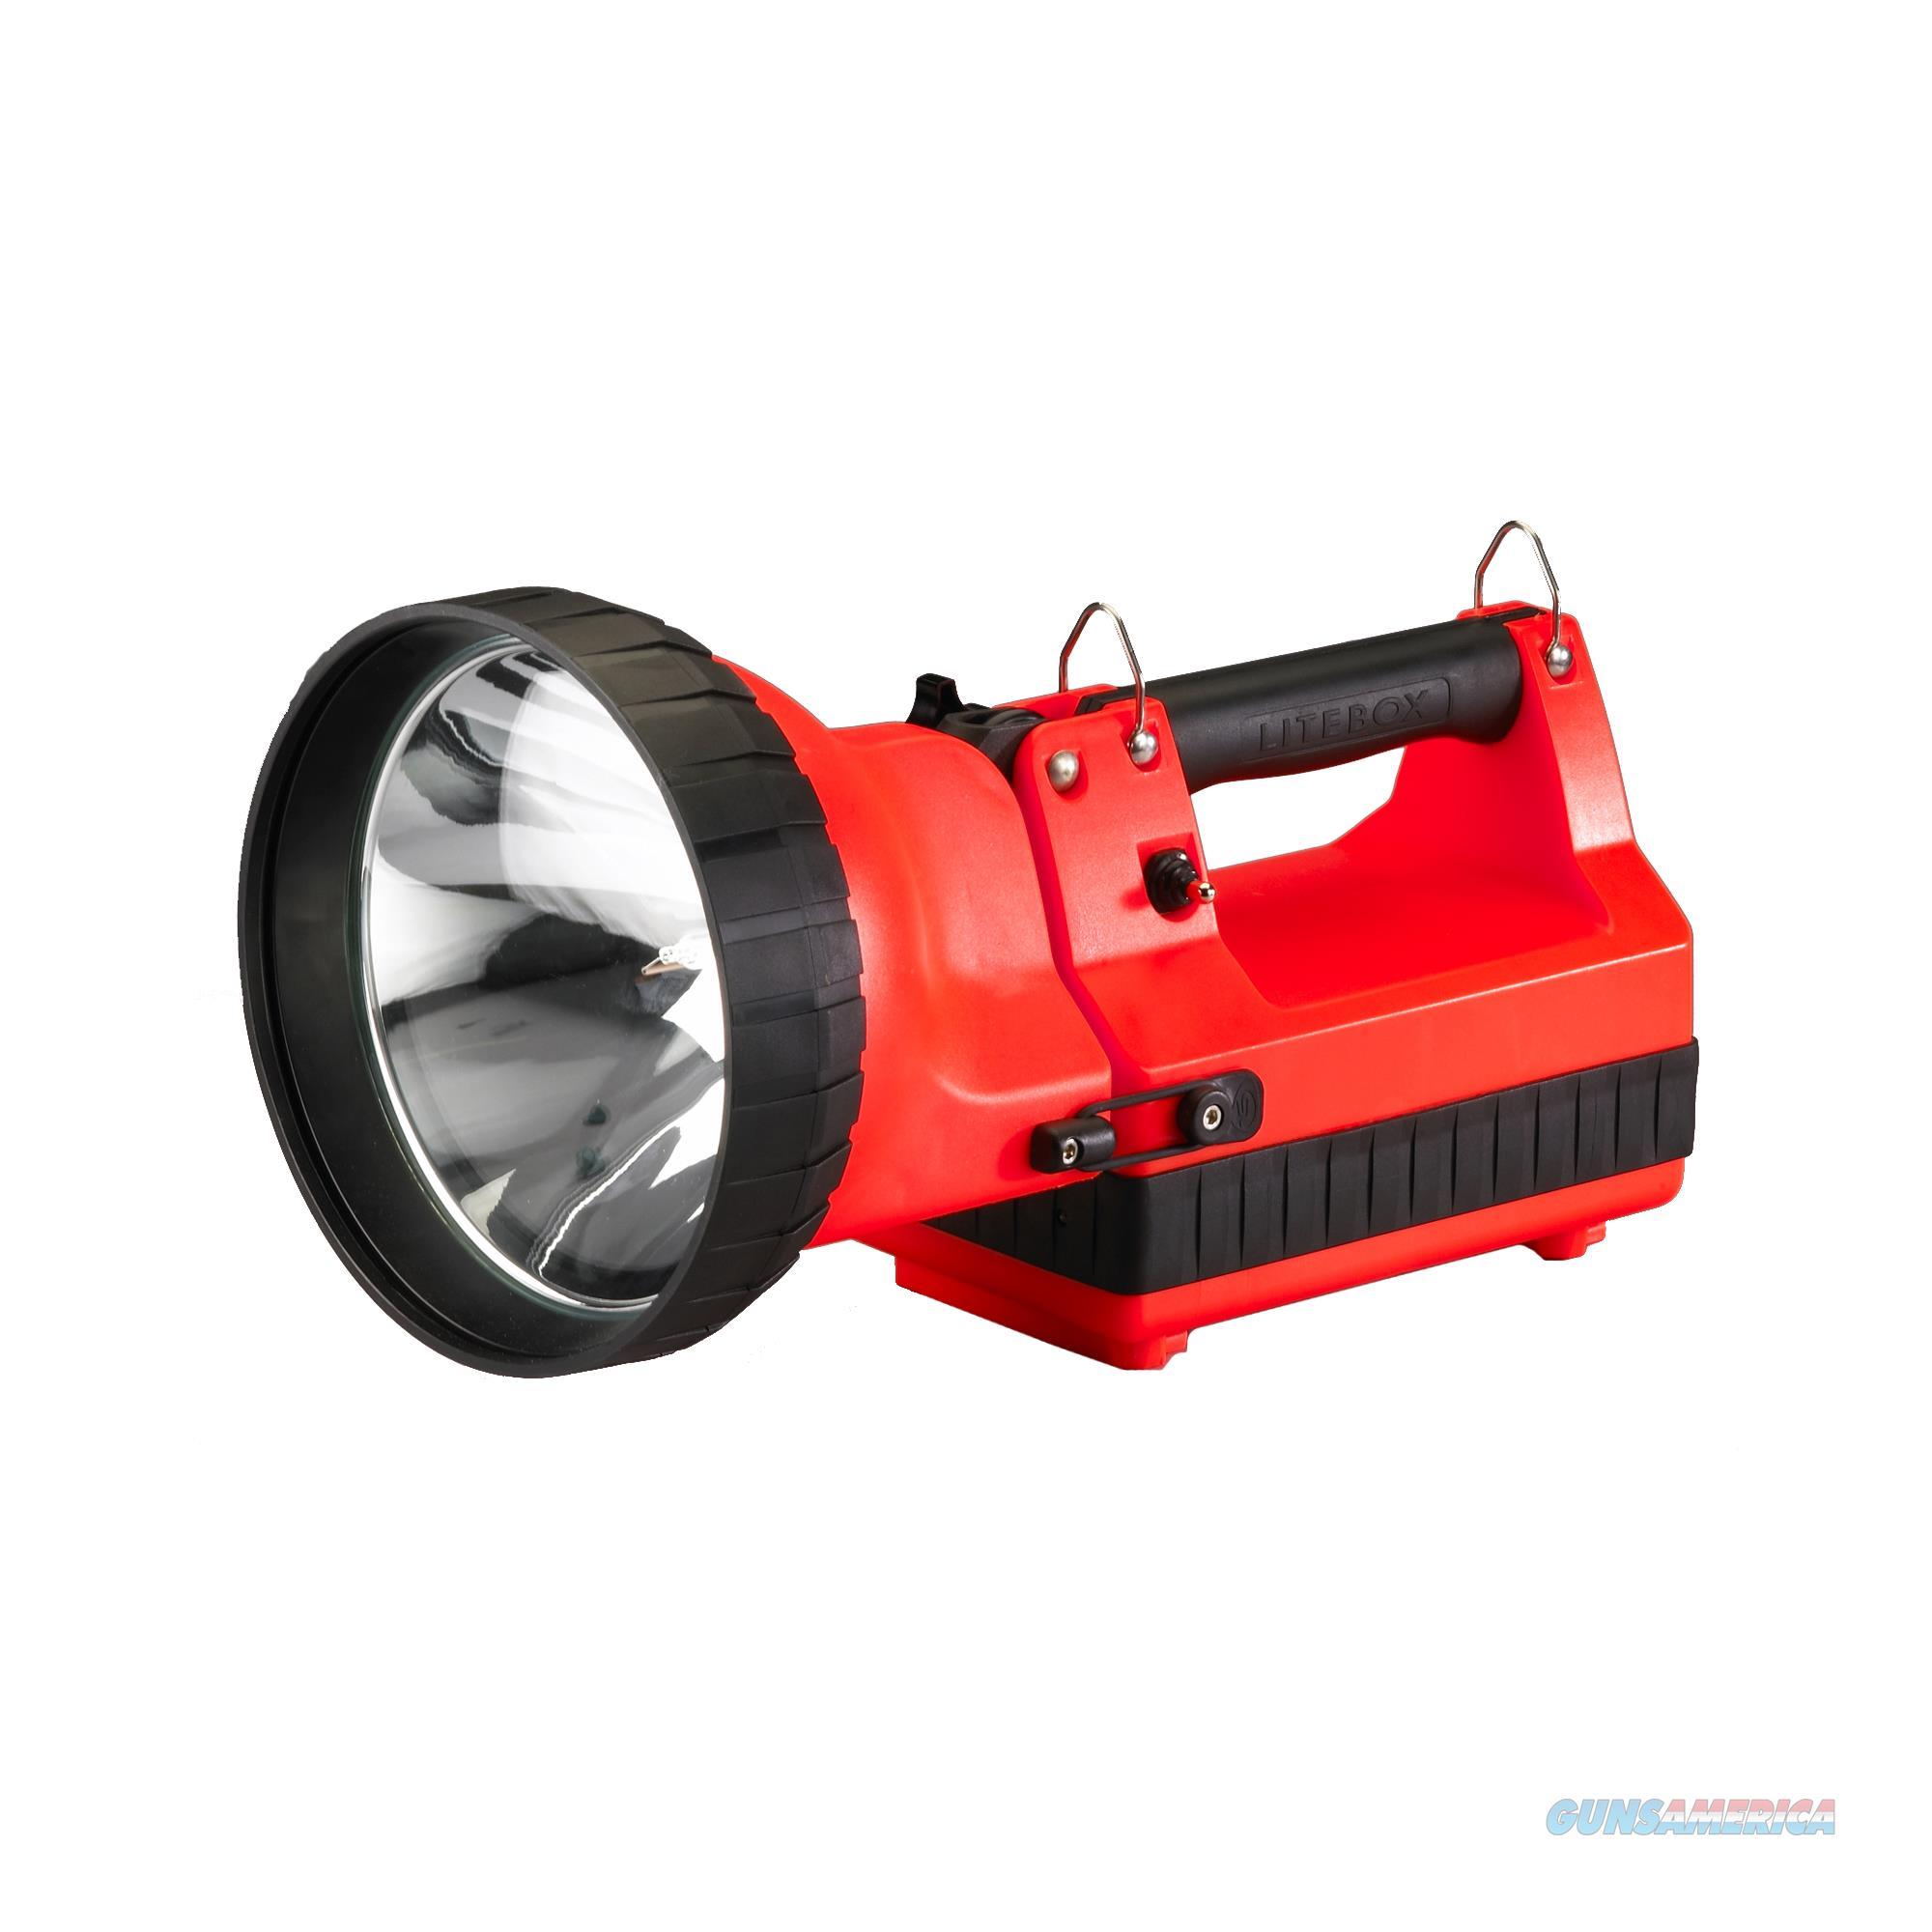 Streamlight Hid Litebox 45605  Non-Guns > Tactical Equipment/Vests